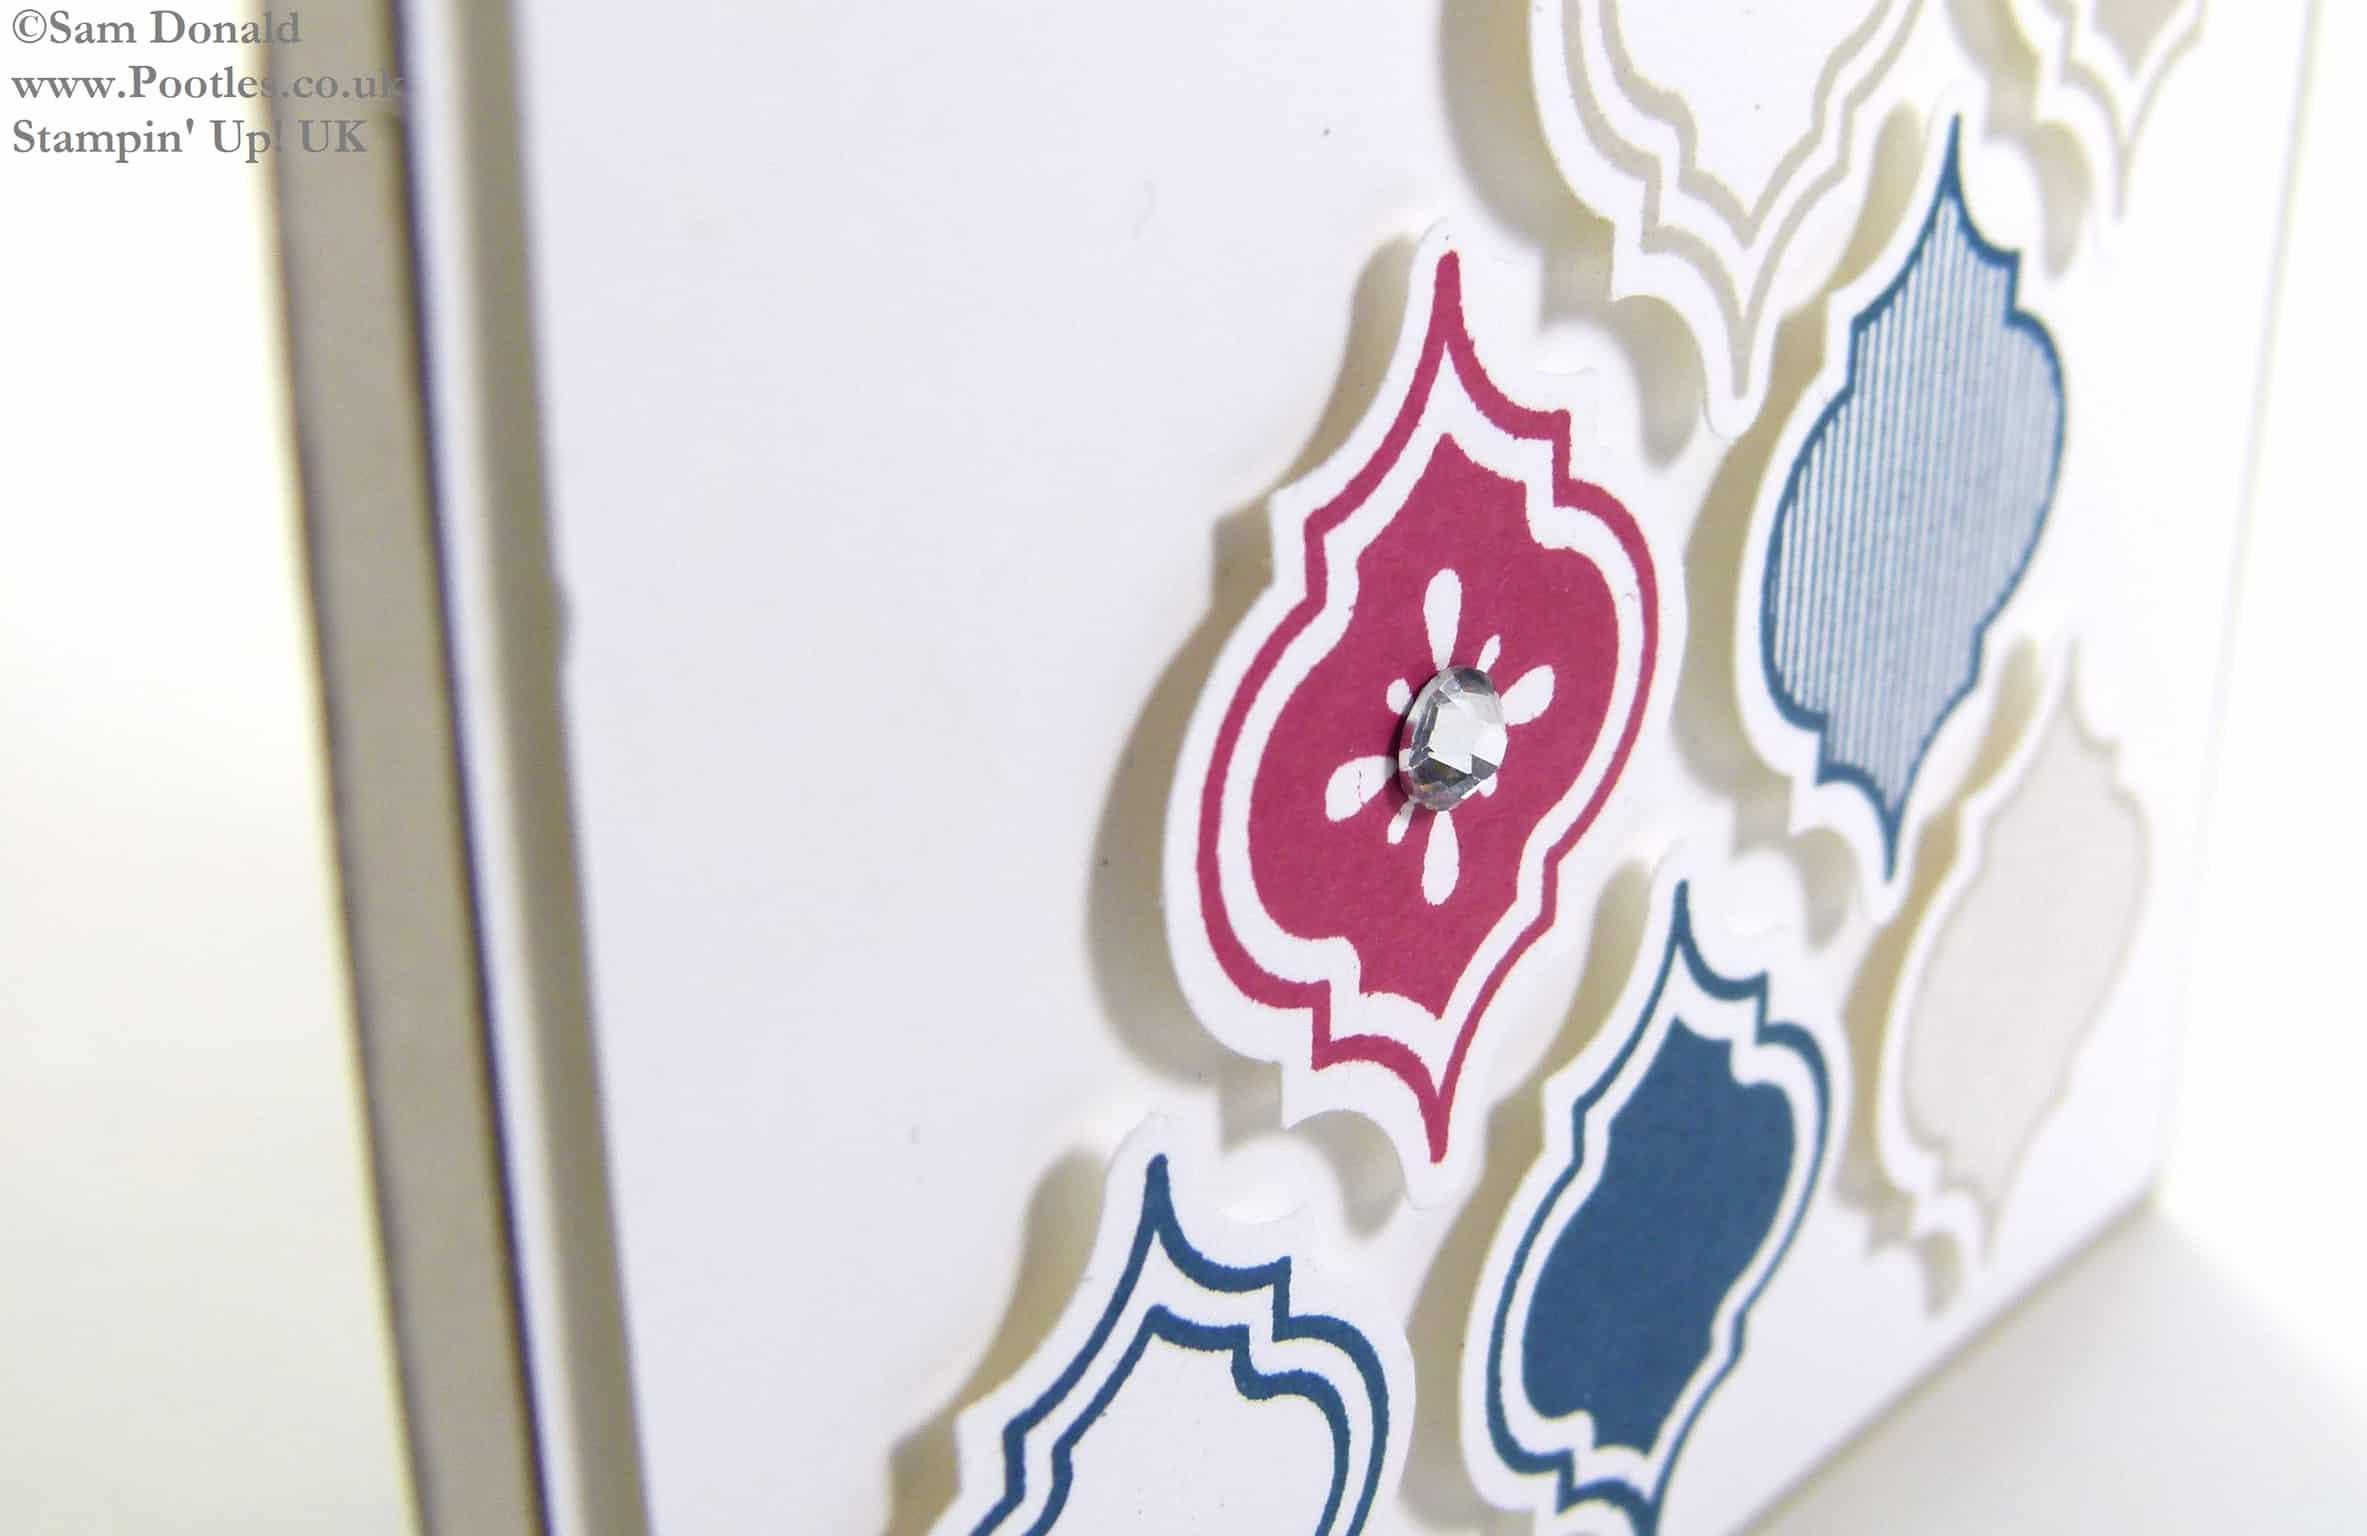 POOTLES Stampin Up UK Modern Mosaic In Colour